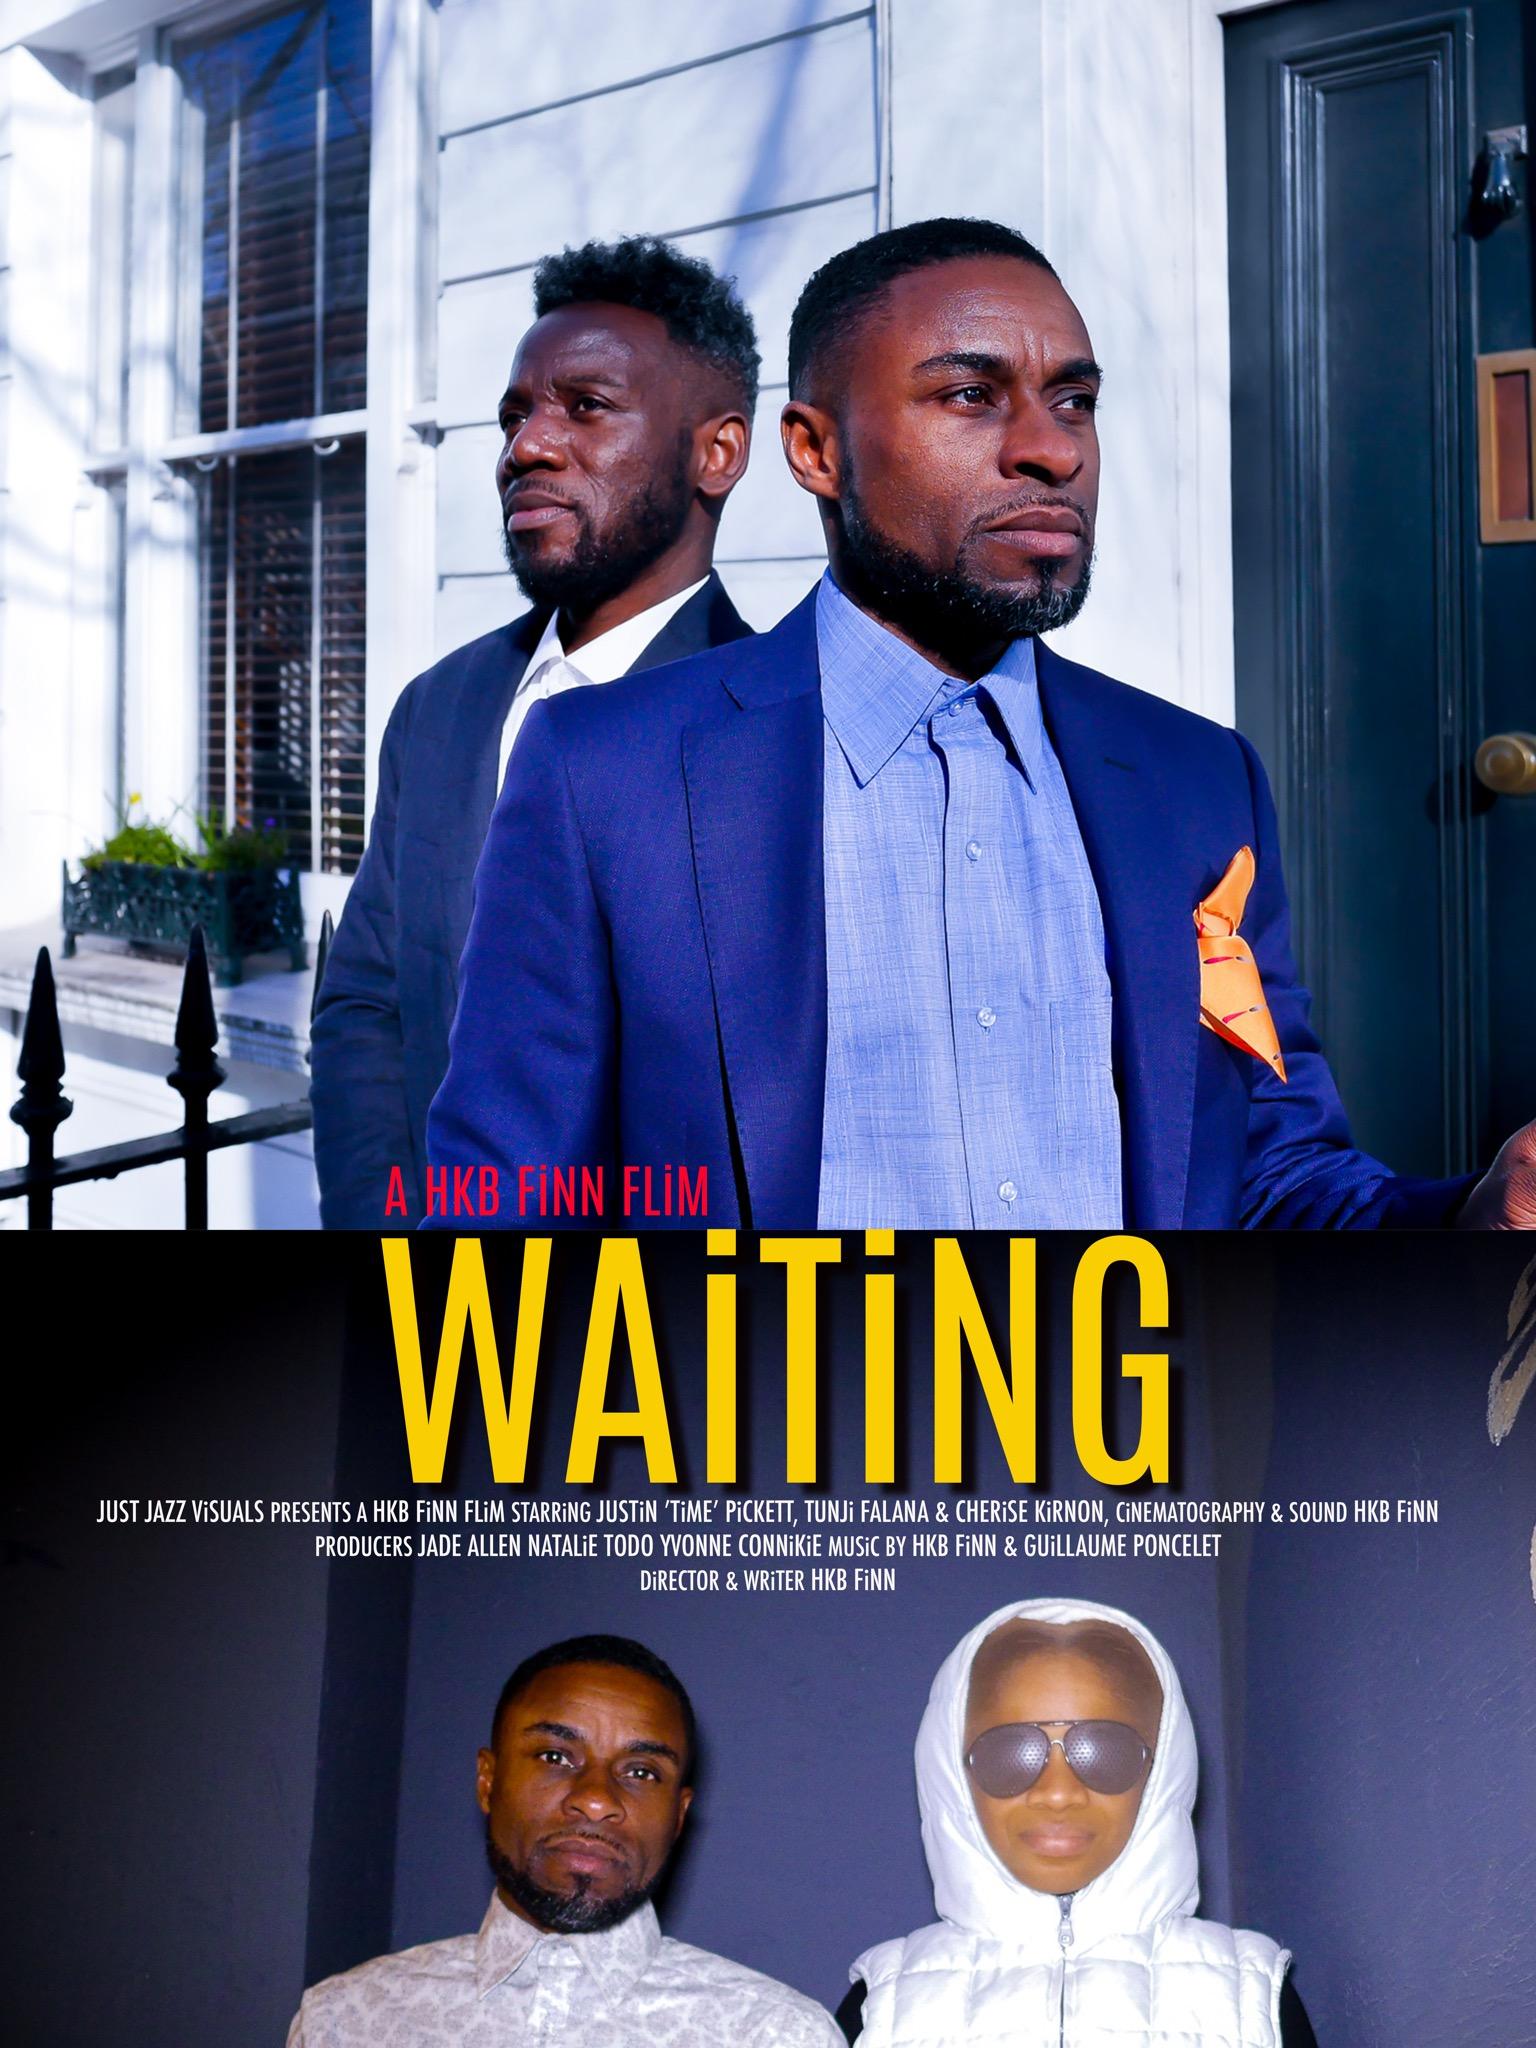 Poster for the short film Waiting by HKB FiNN